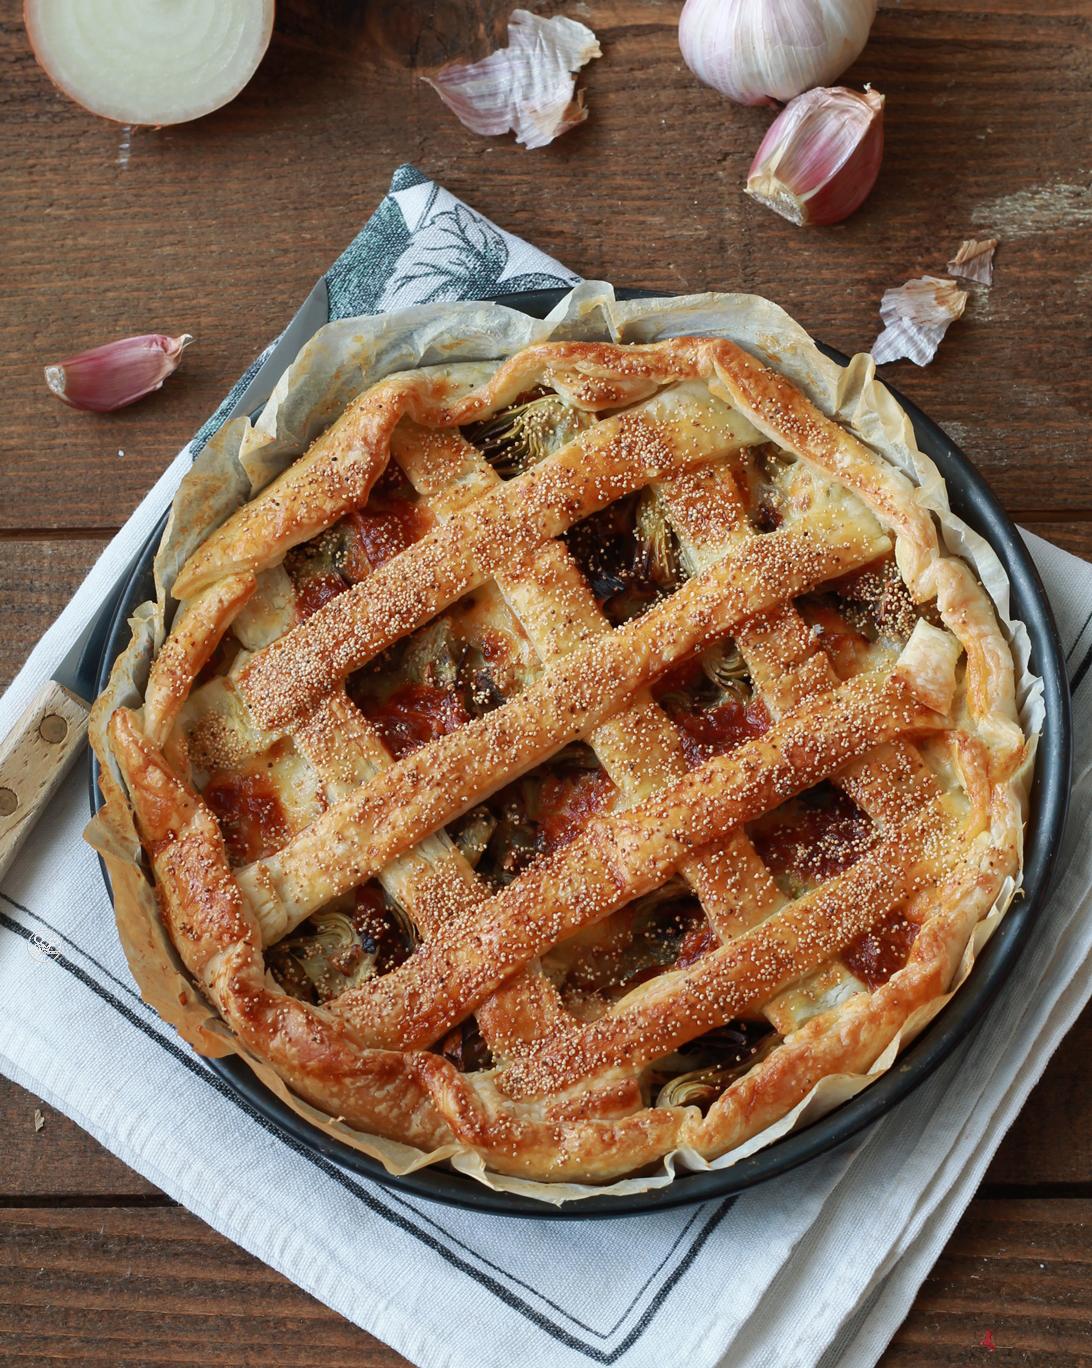 Crostata con carciofi e pancetta senza glutine - La Cassata Celiaca